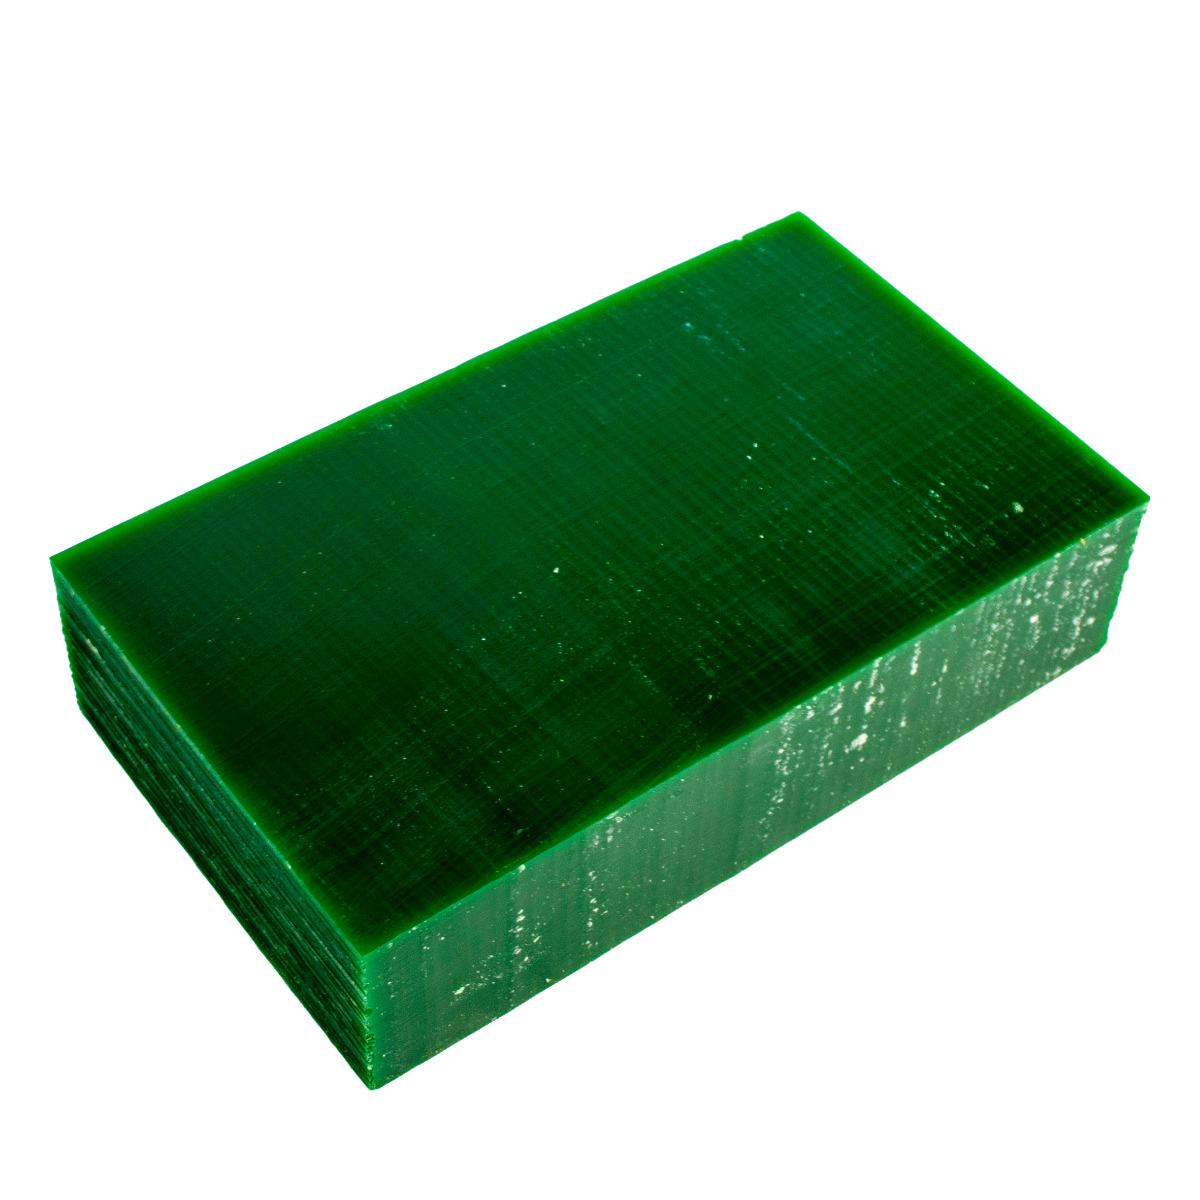 "File-A-Wax Block - Green - Carving Wax 1lb Box 3-5/8"" x 6"" x 1-1/2"" Thick"